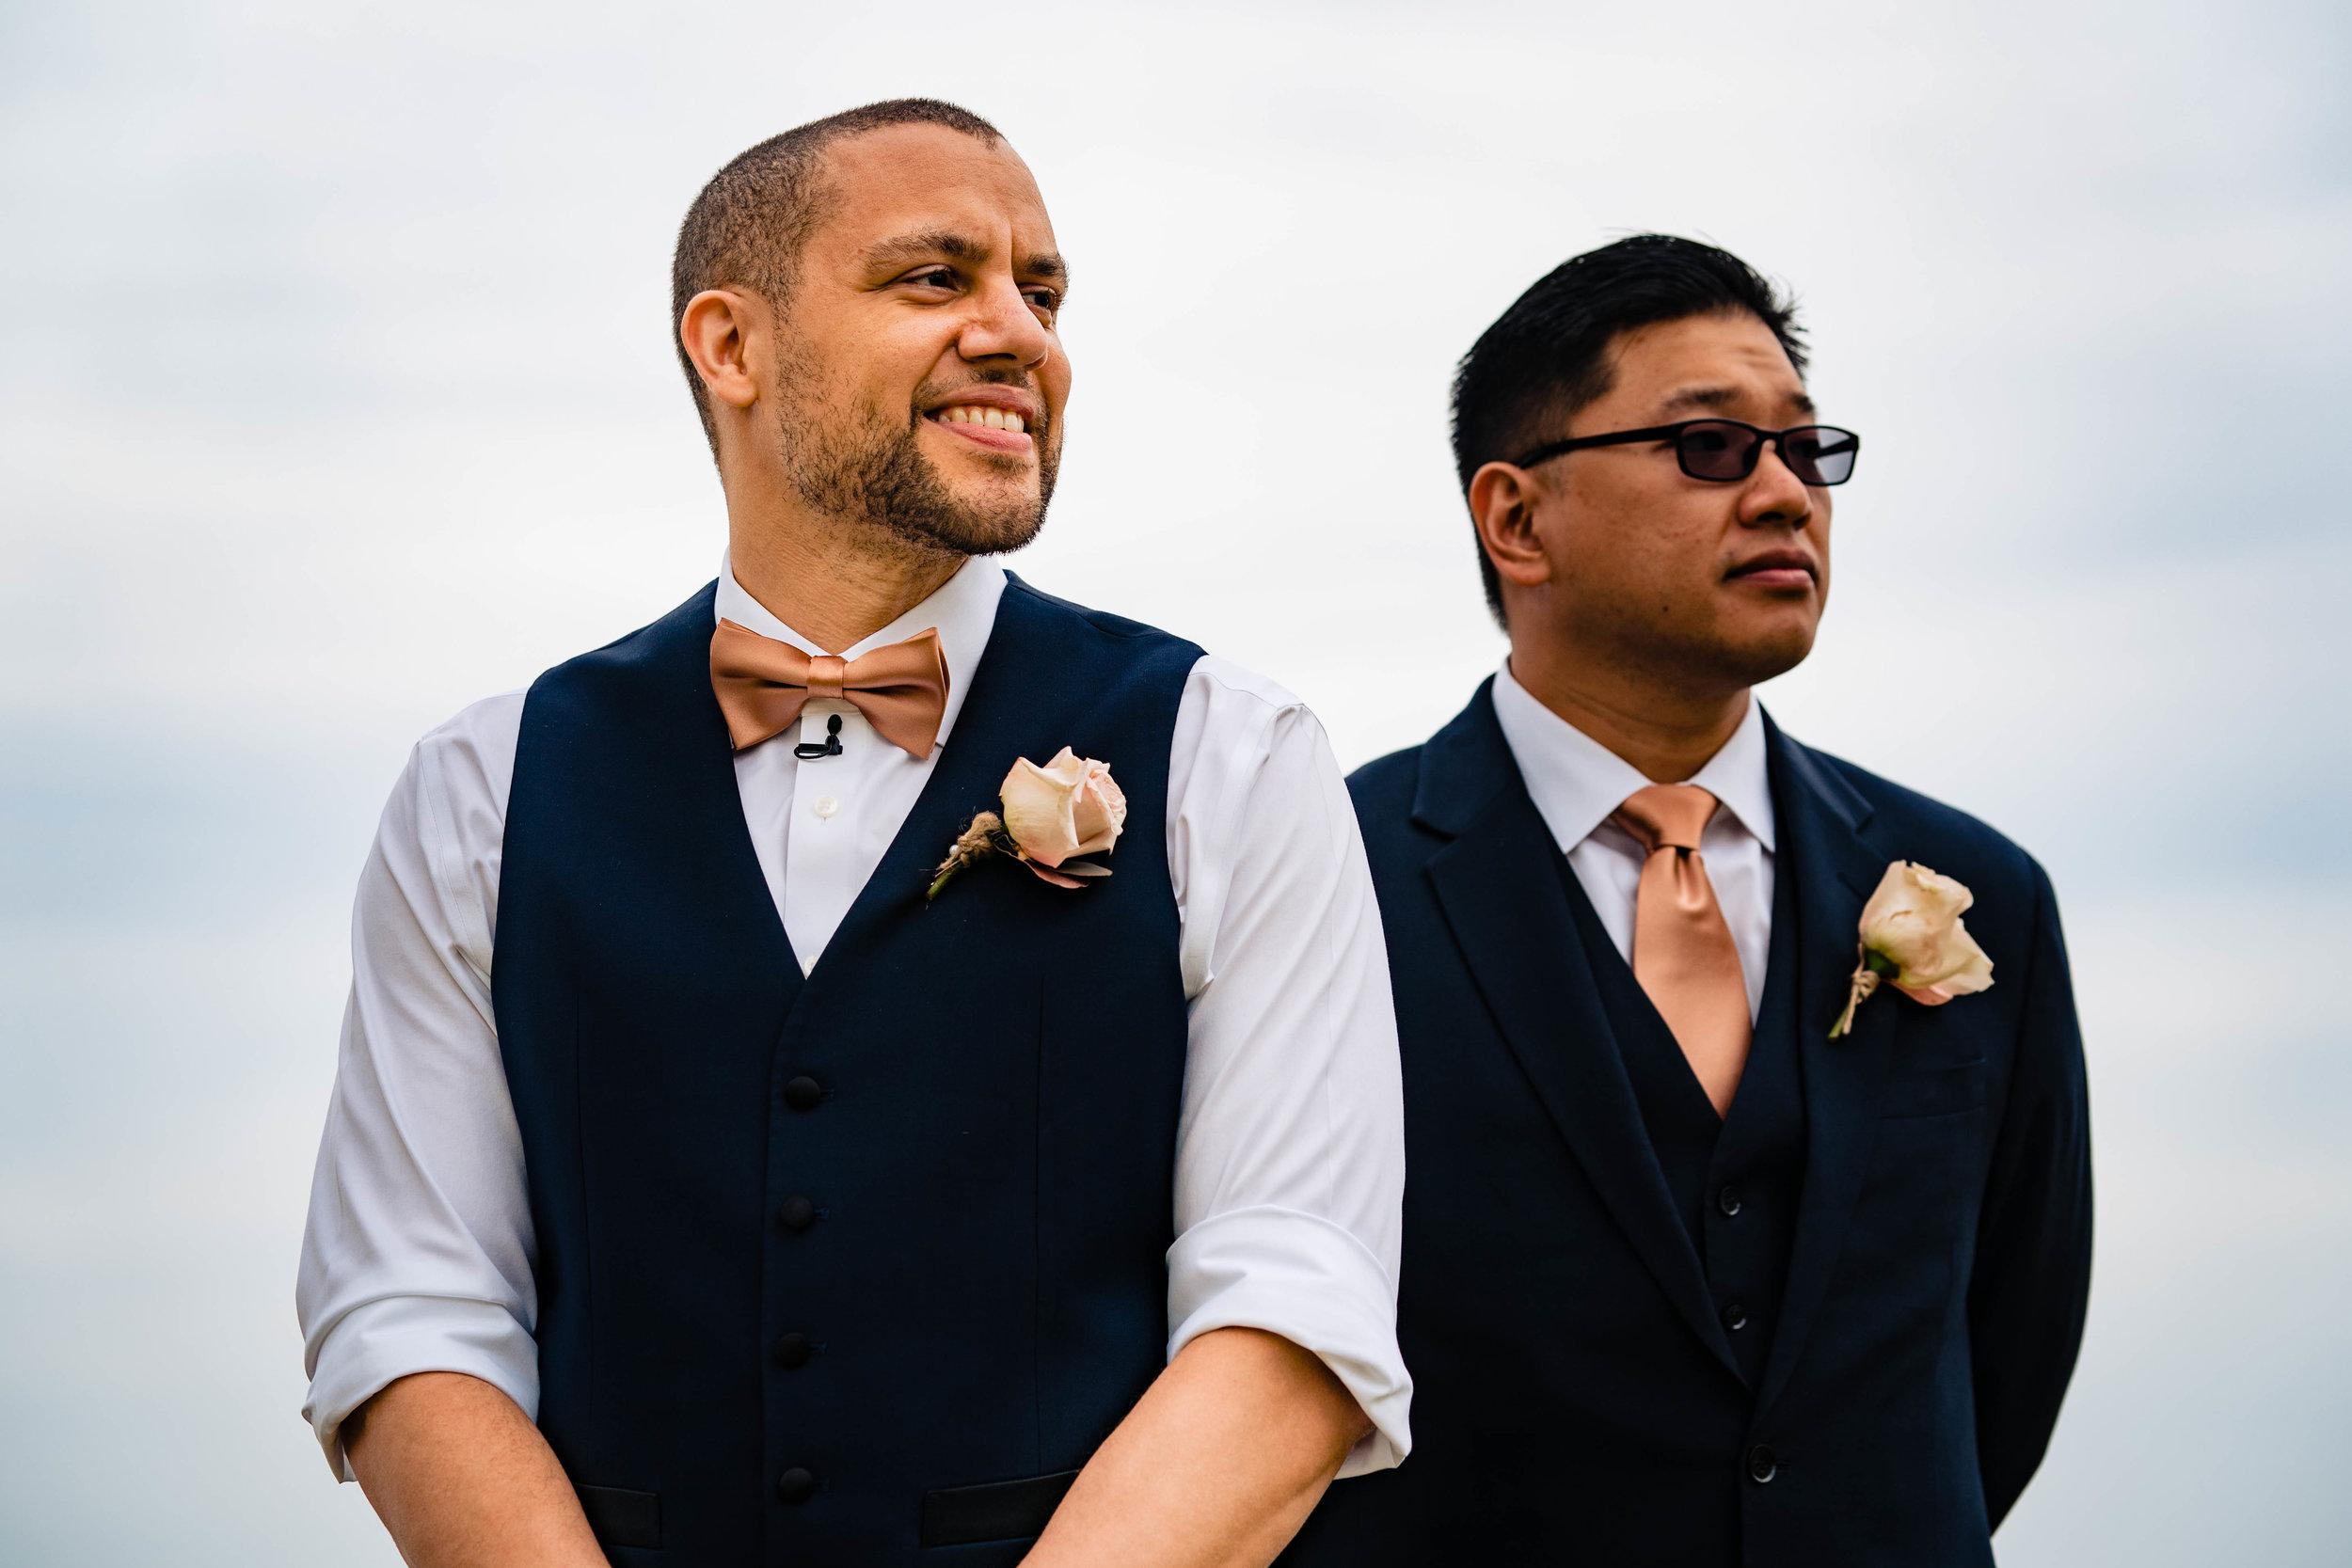 copper-ridge-on-the-neuse-wedding-001tephanie&Roberto-Wedding-363.jpg